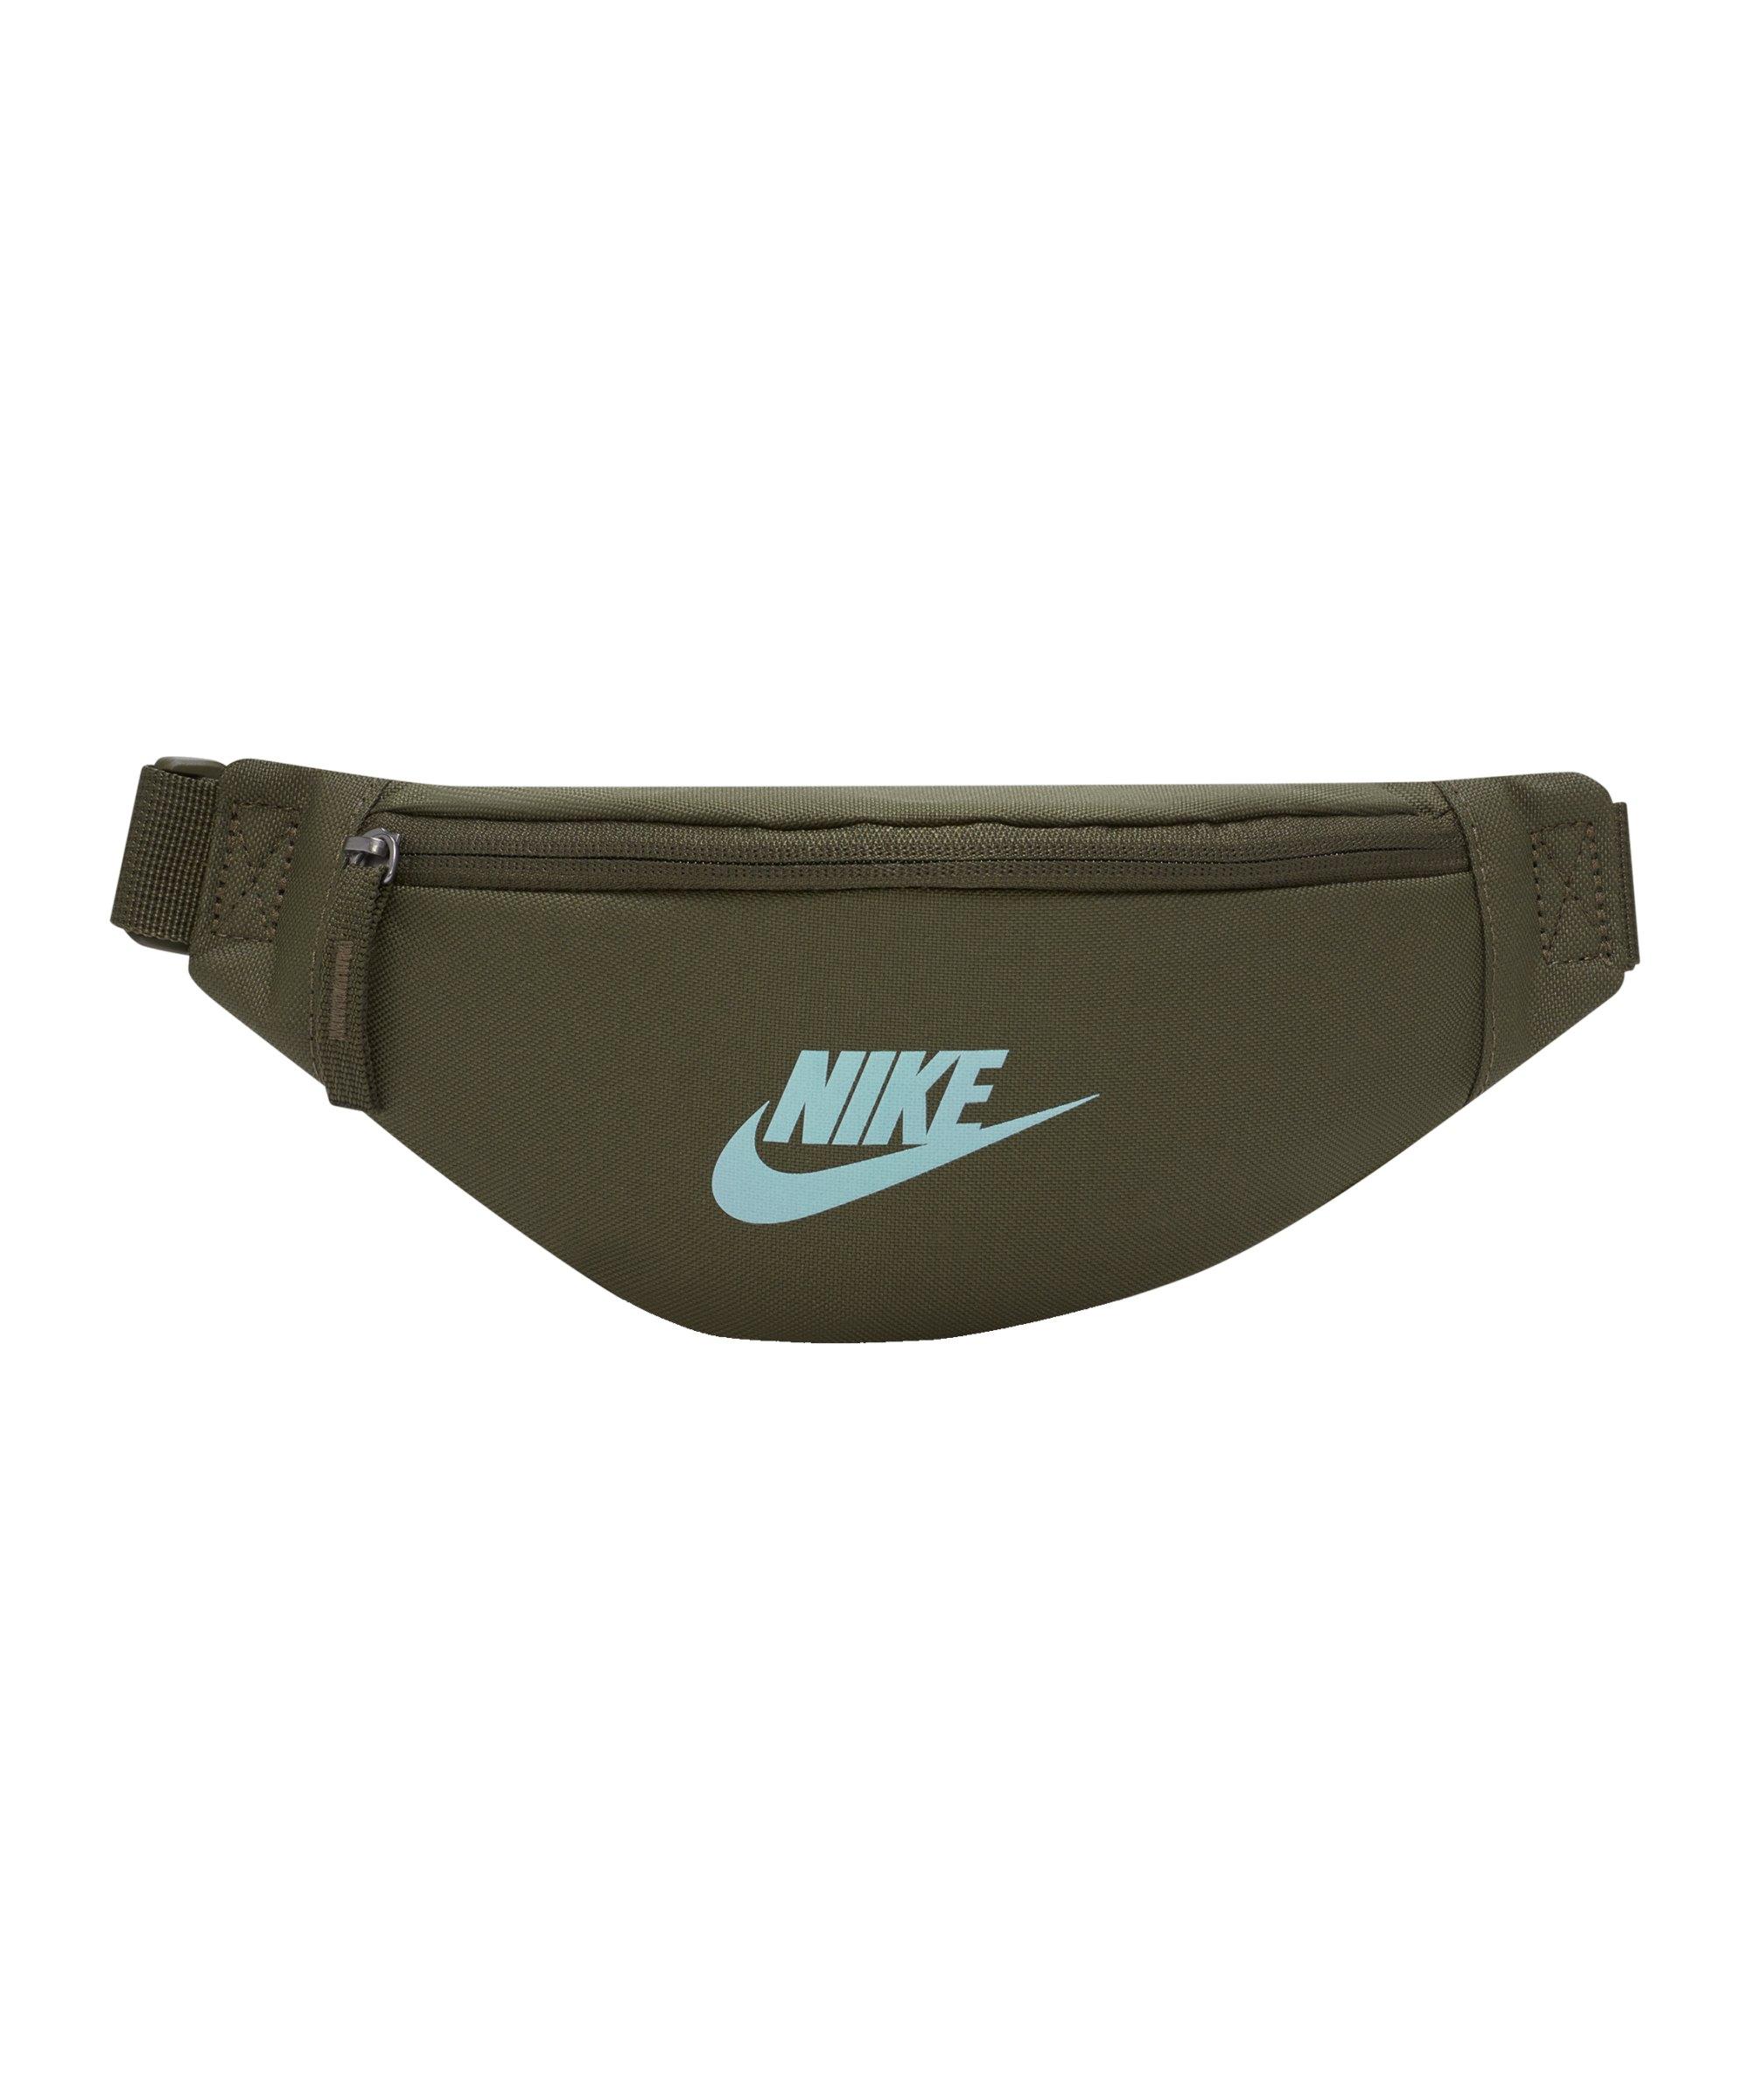 Nike Heritage Hüfttasche Khaki F325 - khaki